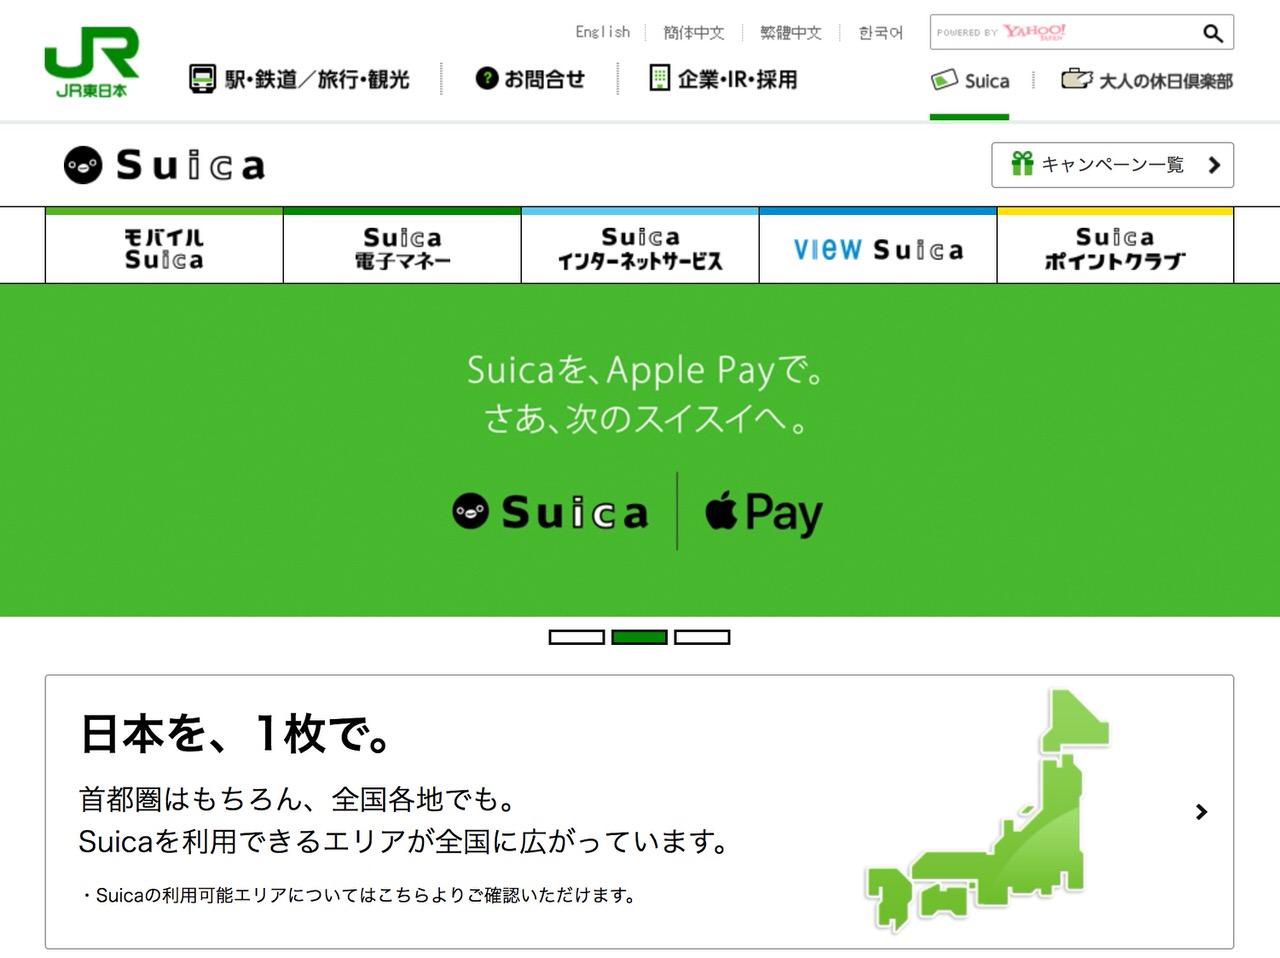 「Suica」改札出るときもオートチャージ可能に 〜2018年3月17日より